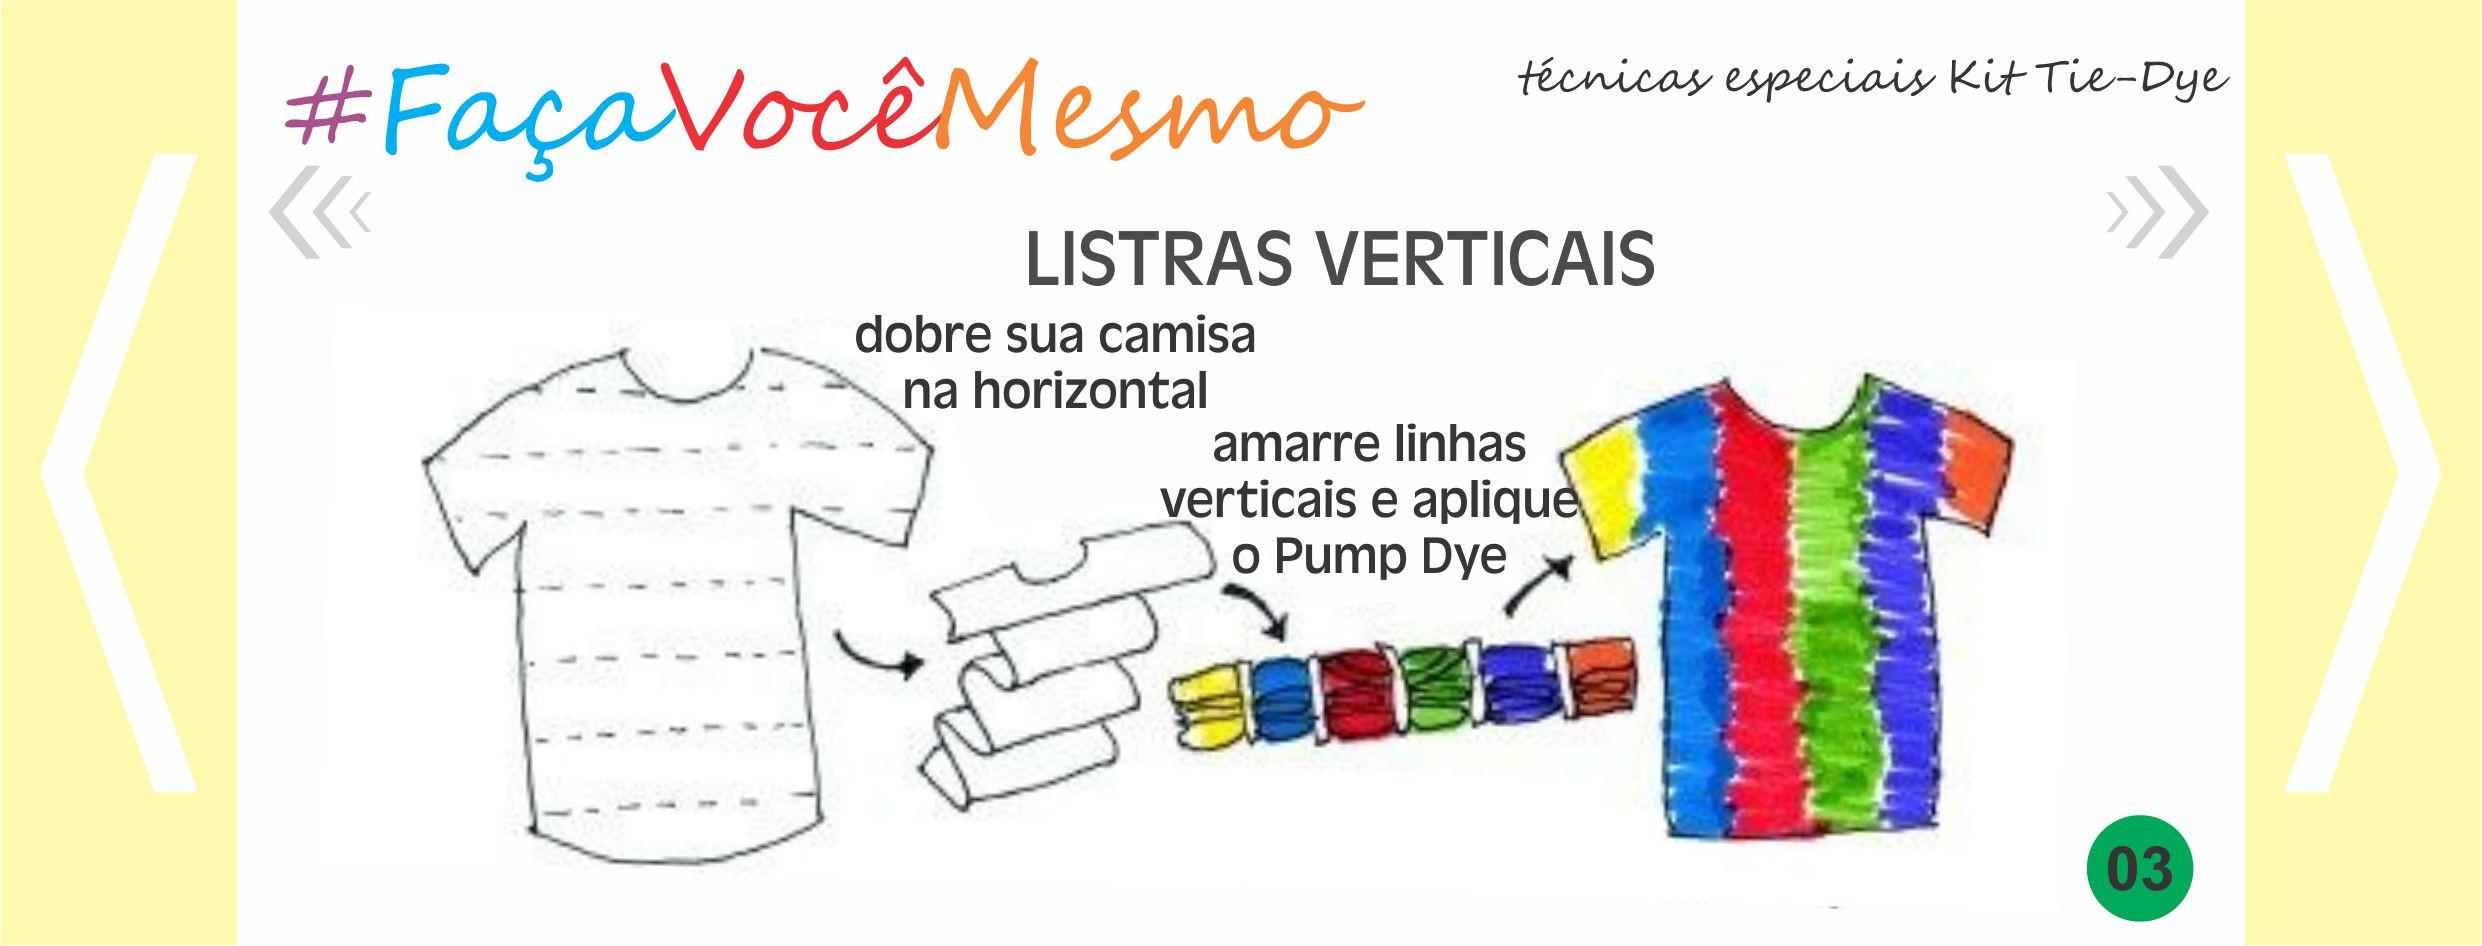 banner kit tie-dye pump dye 03.jpg